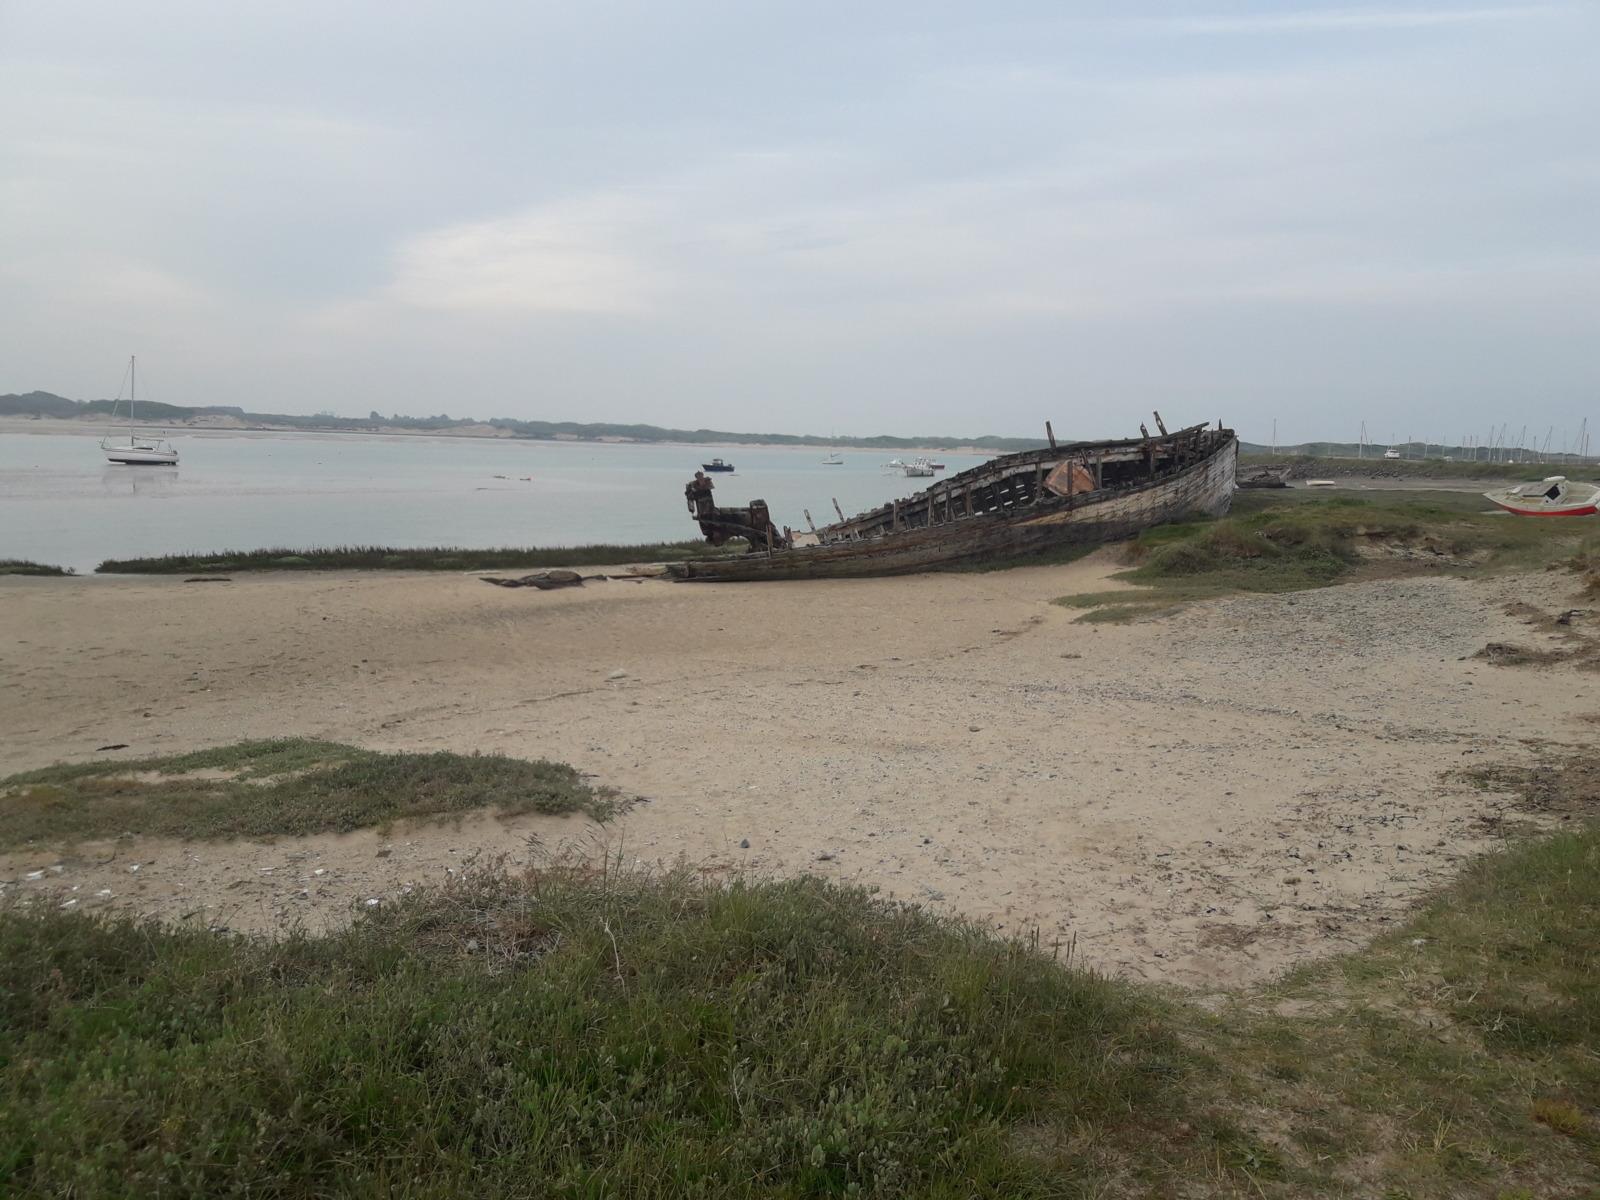 Beach, rotting boat